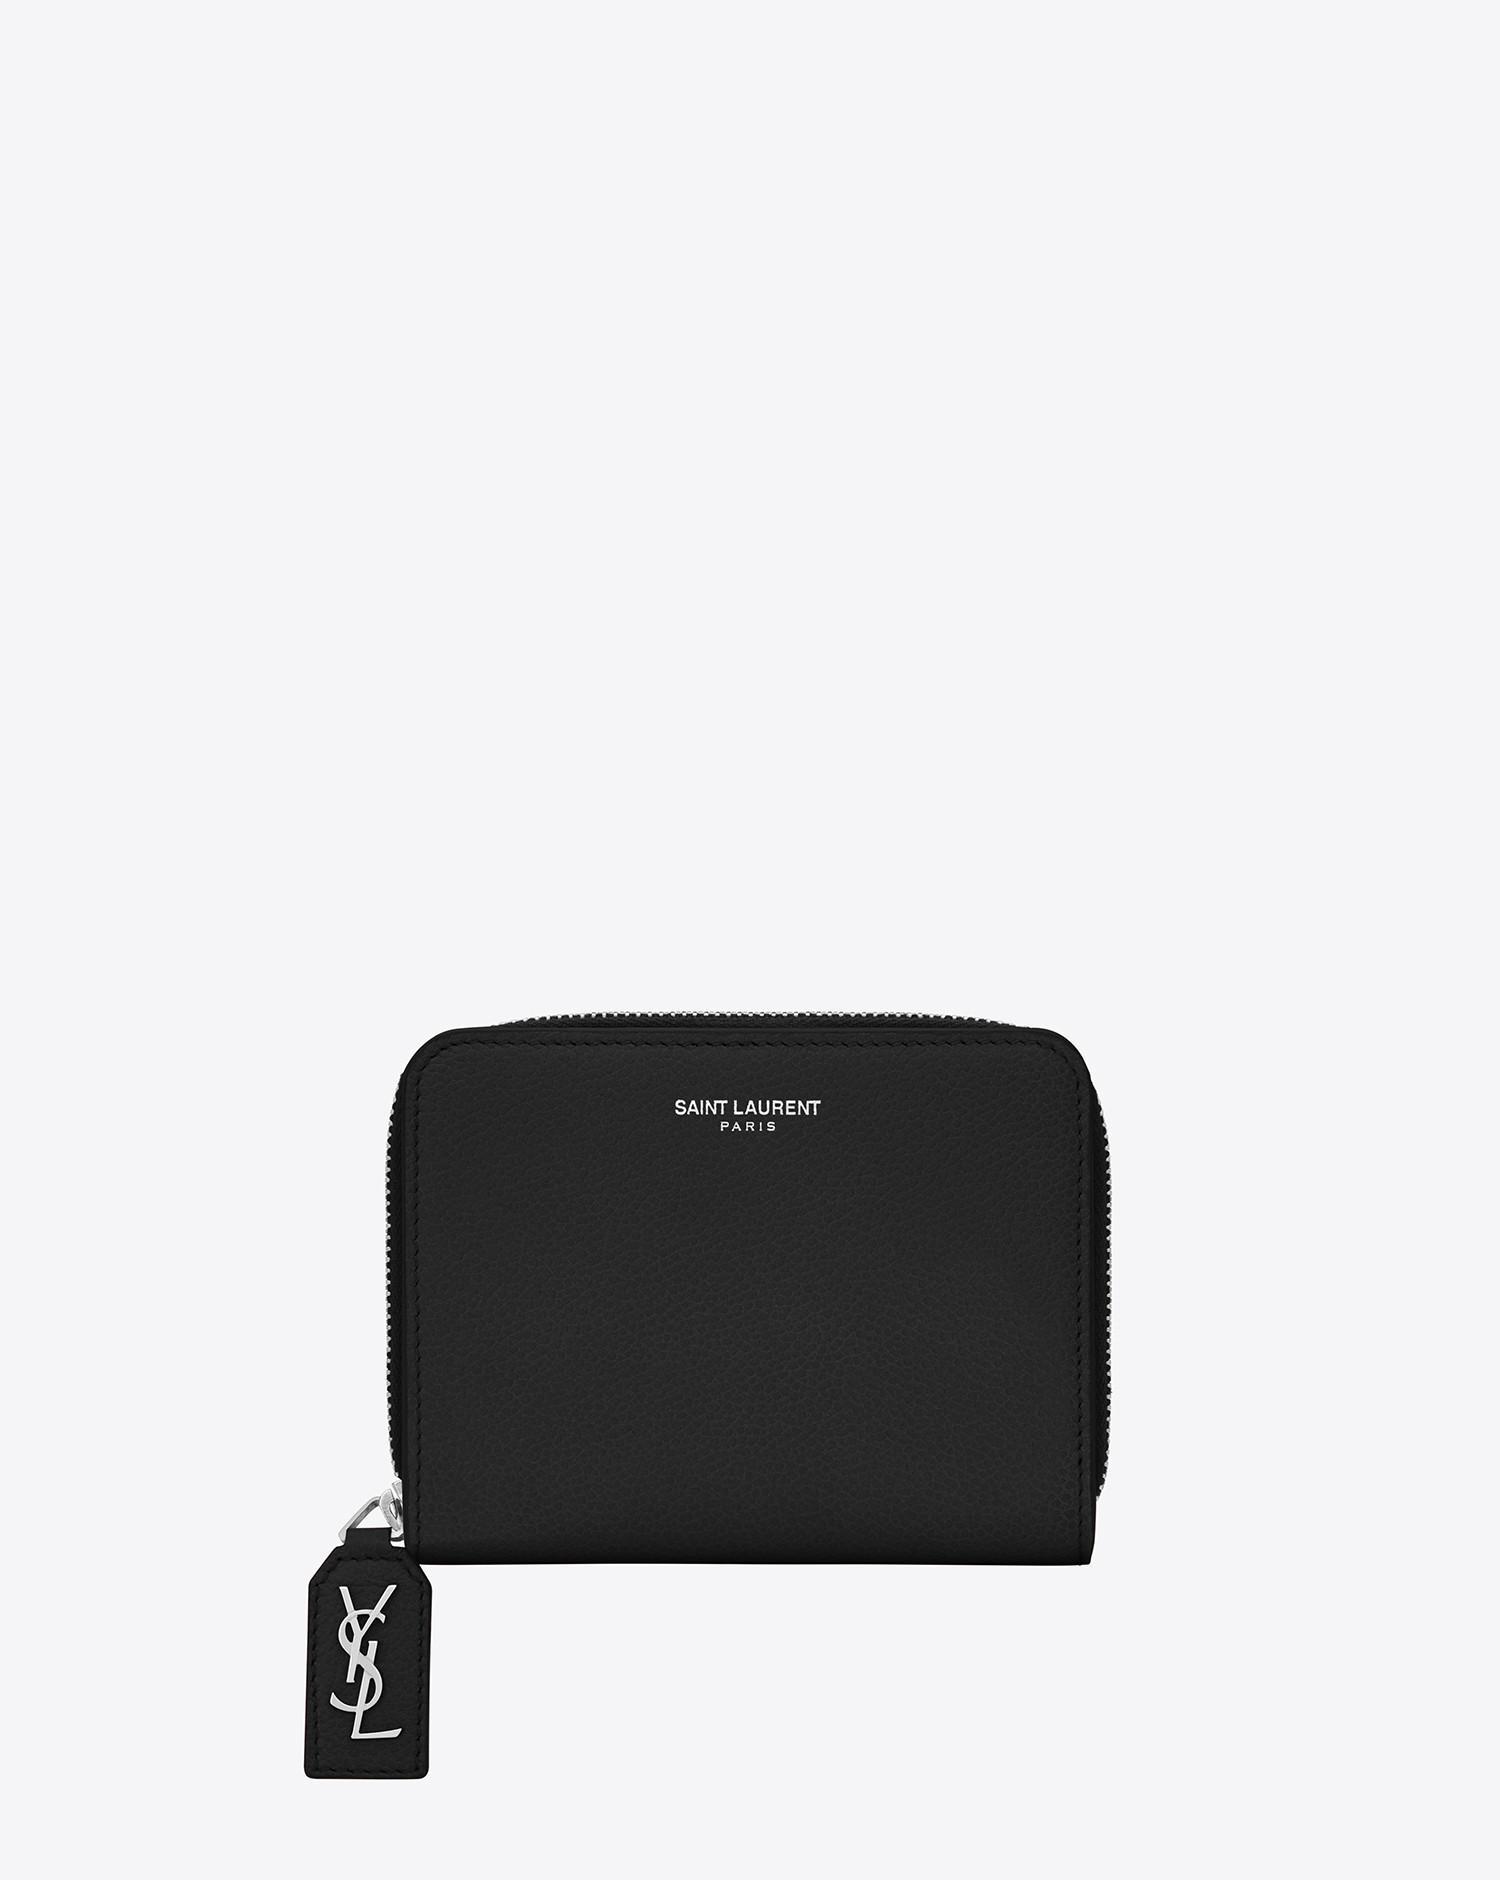 68017addee Saint Laurent Black Rive Gauche Compact Zip Around Wallet In Grained Leather